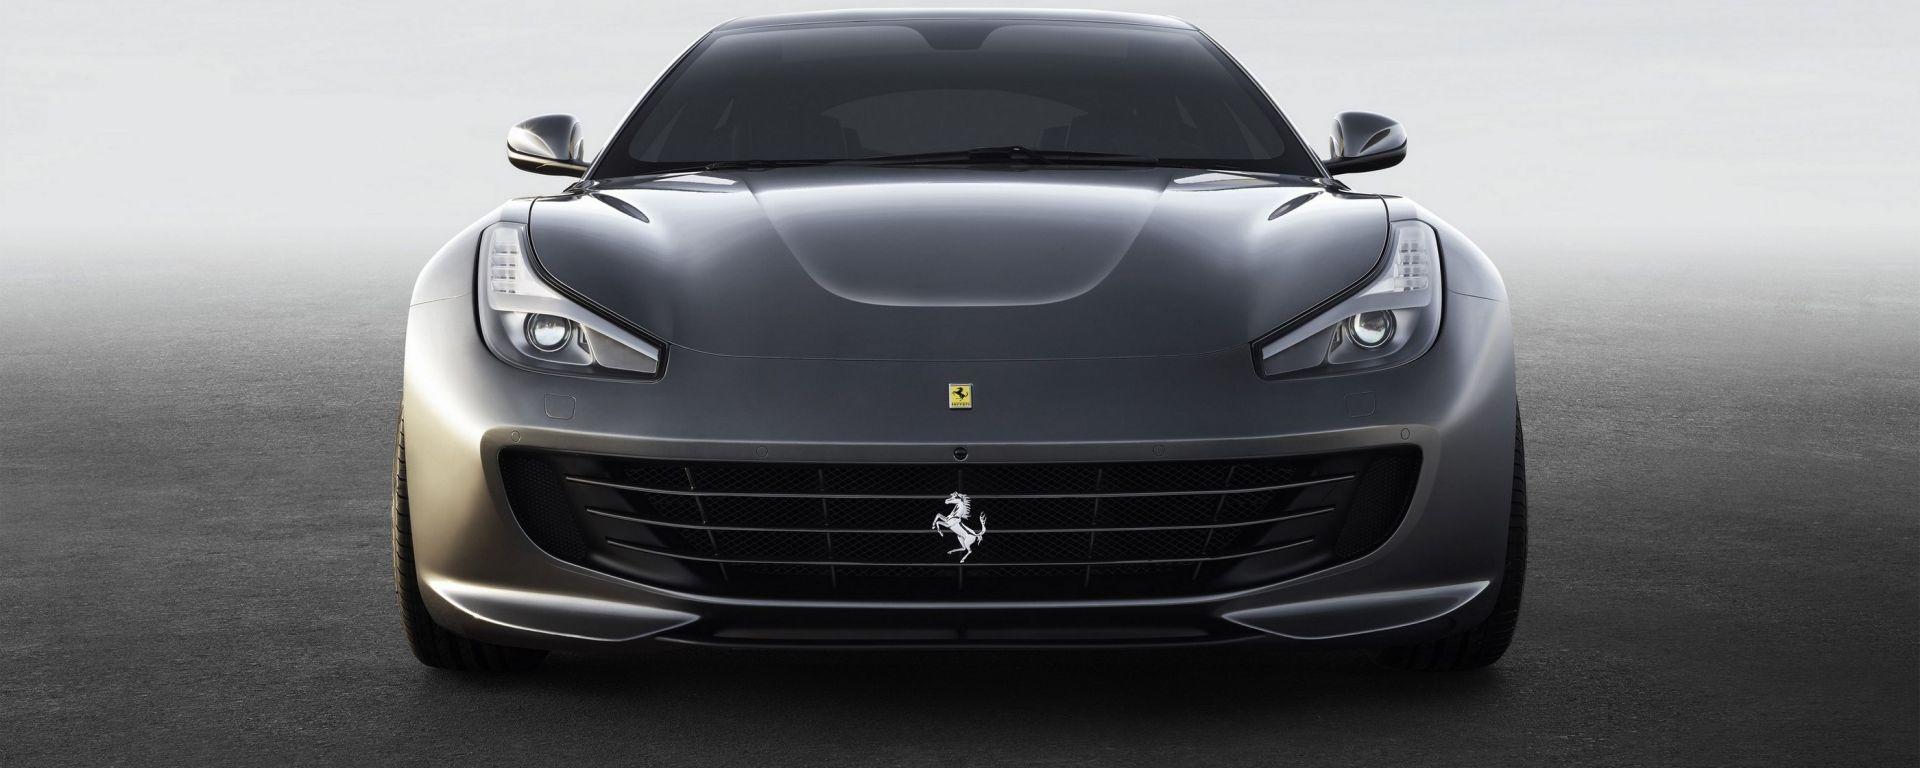 Ferrari GTC4 Lusso: vista frontale